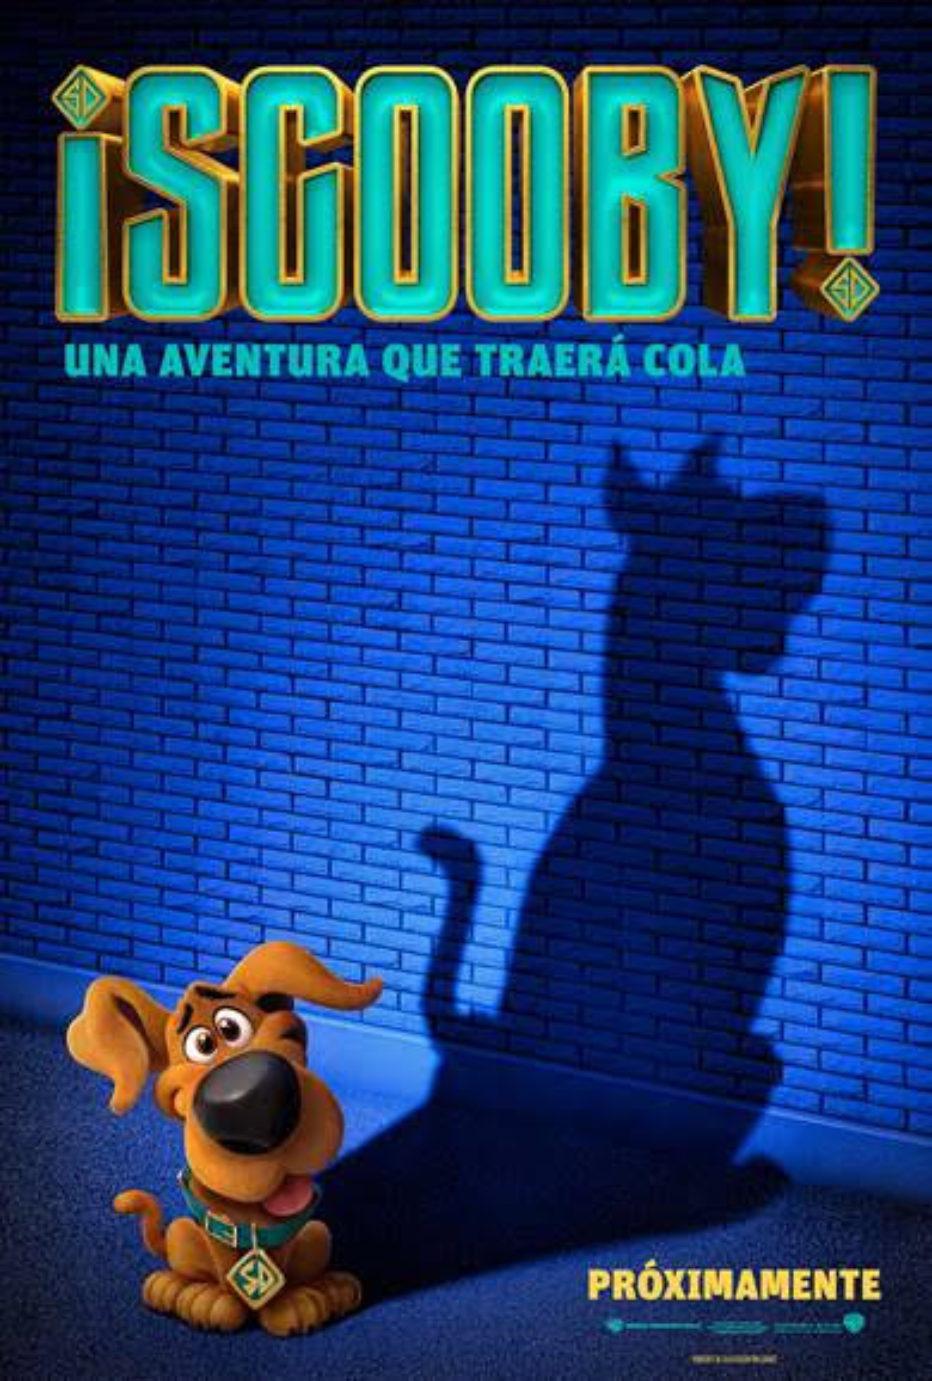 «¡SCOOBY!» – Primer trailer